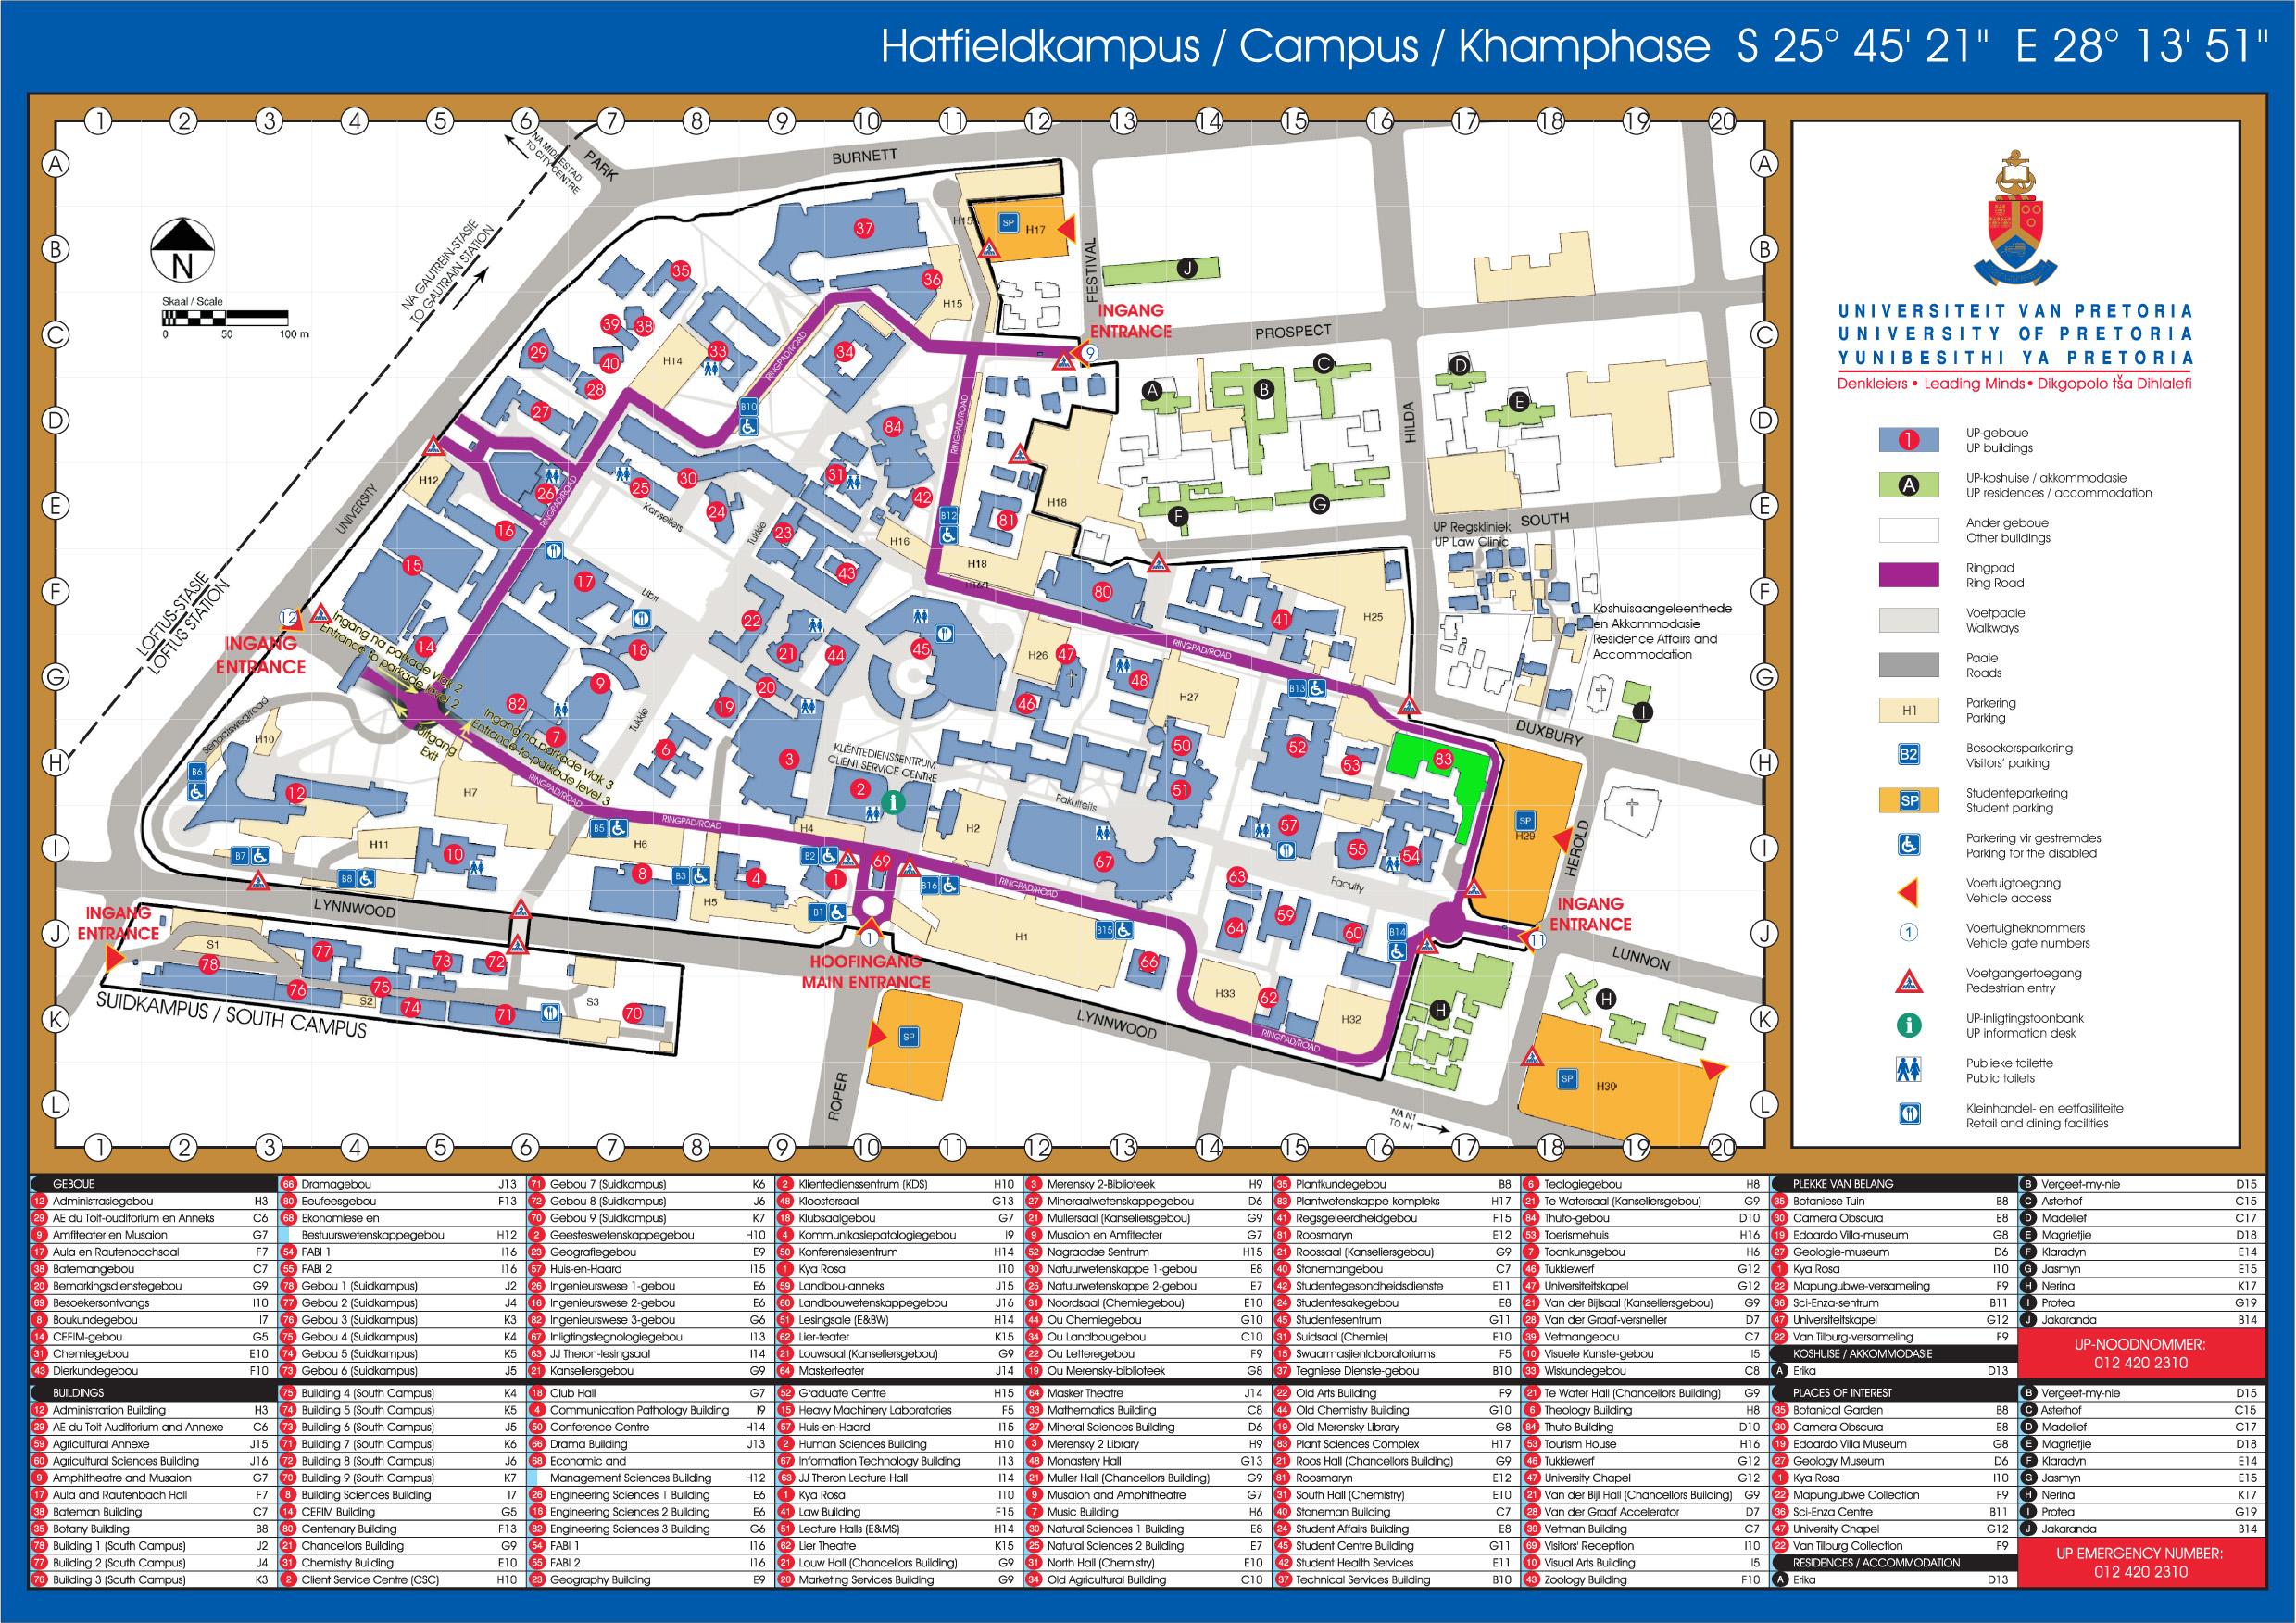 university of pretoria campus map Contact Us Article University Of Pretoria university of pretoria campus map